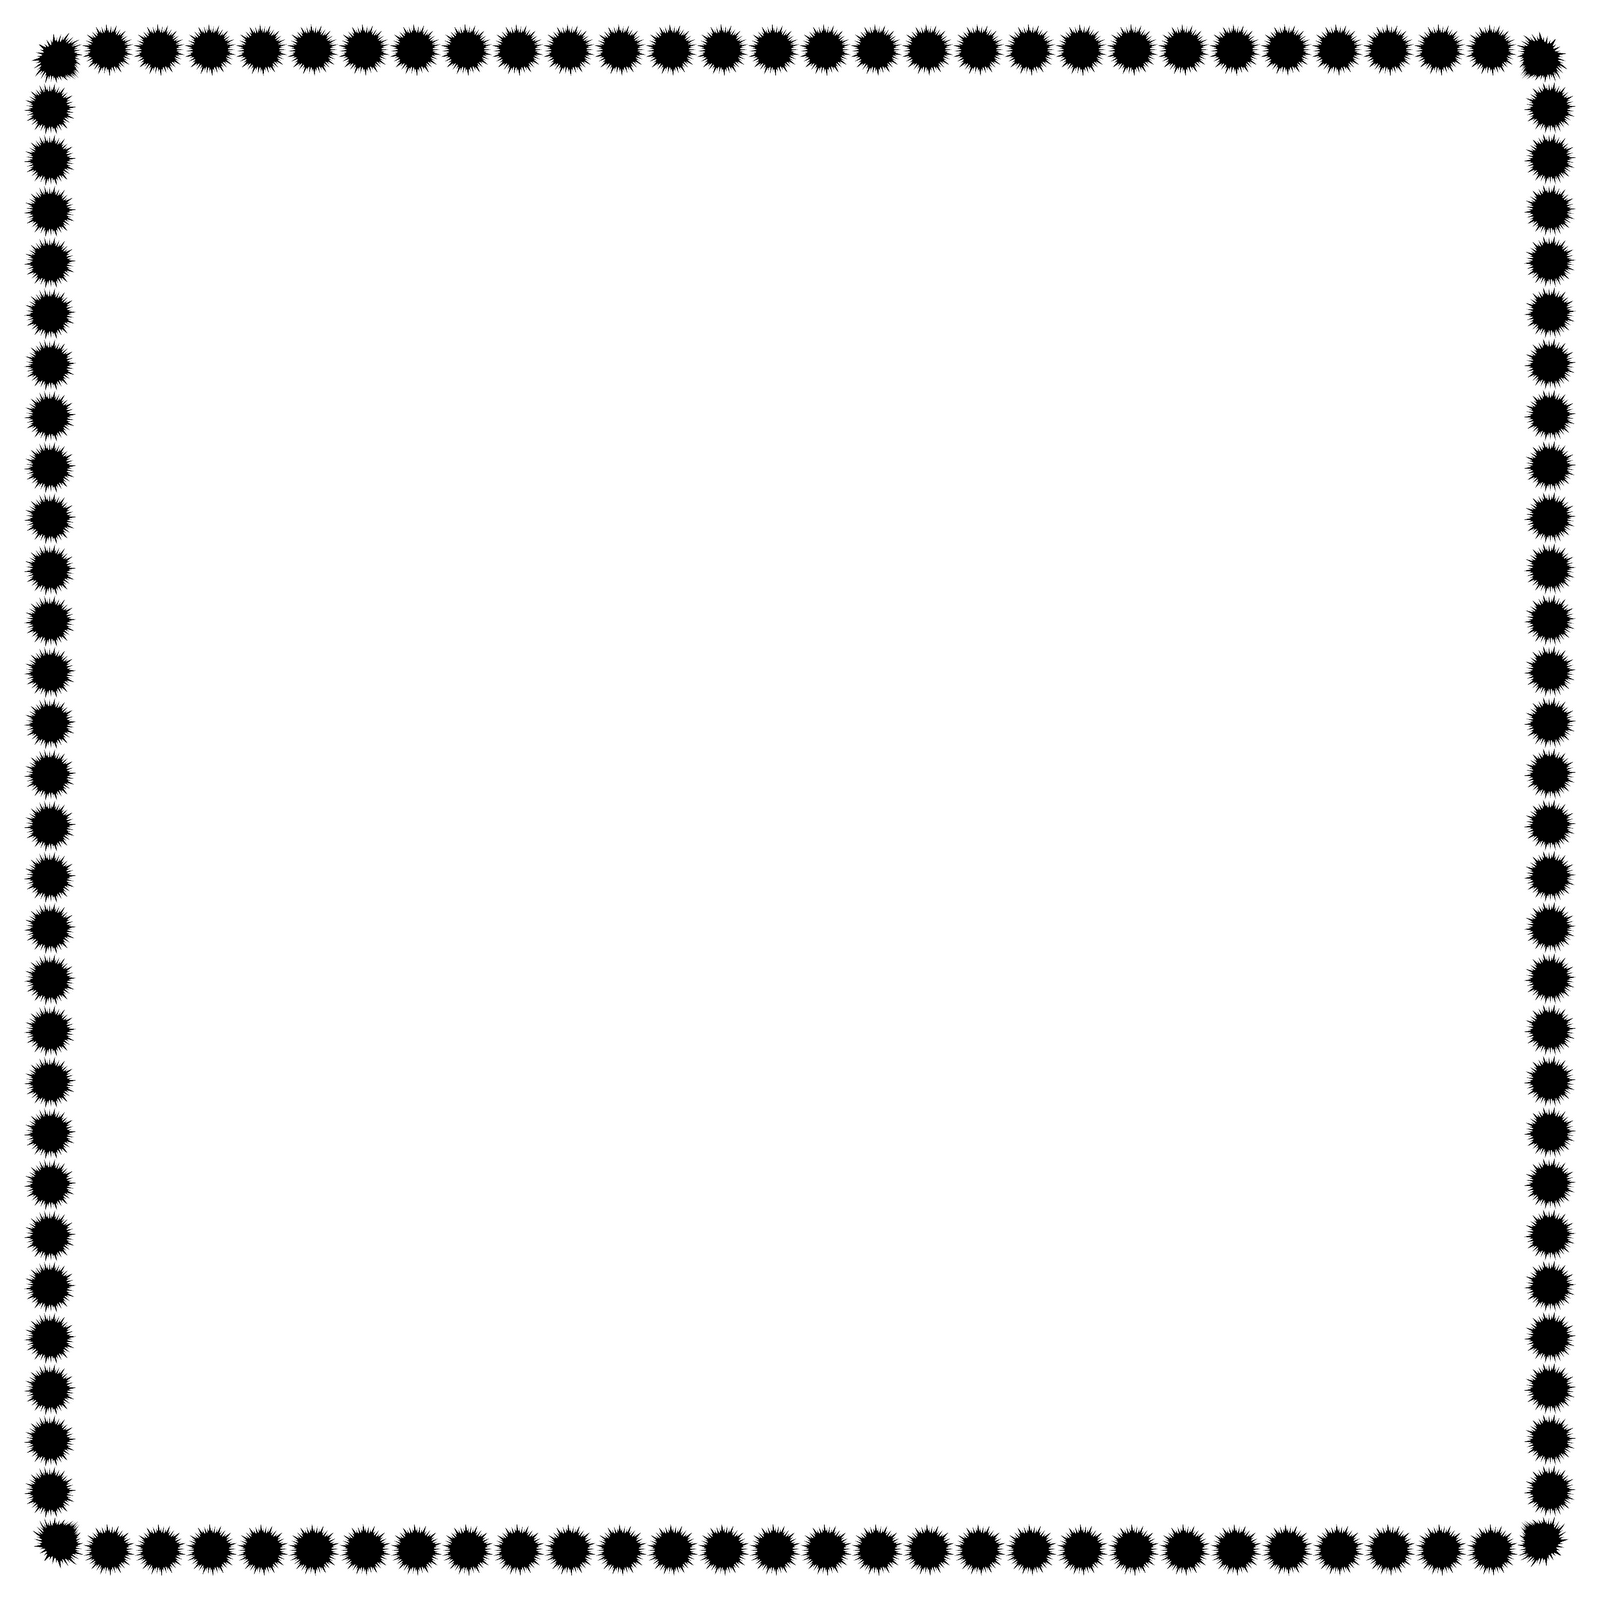 Black And White Polka Dot Page Border Clip Art